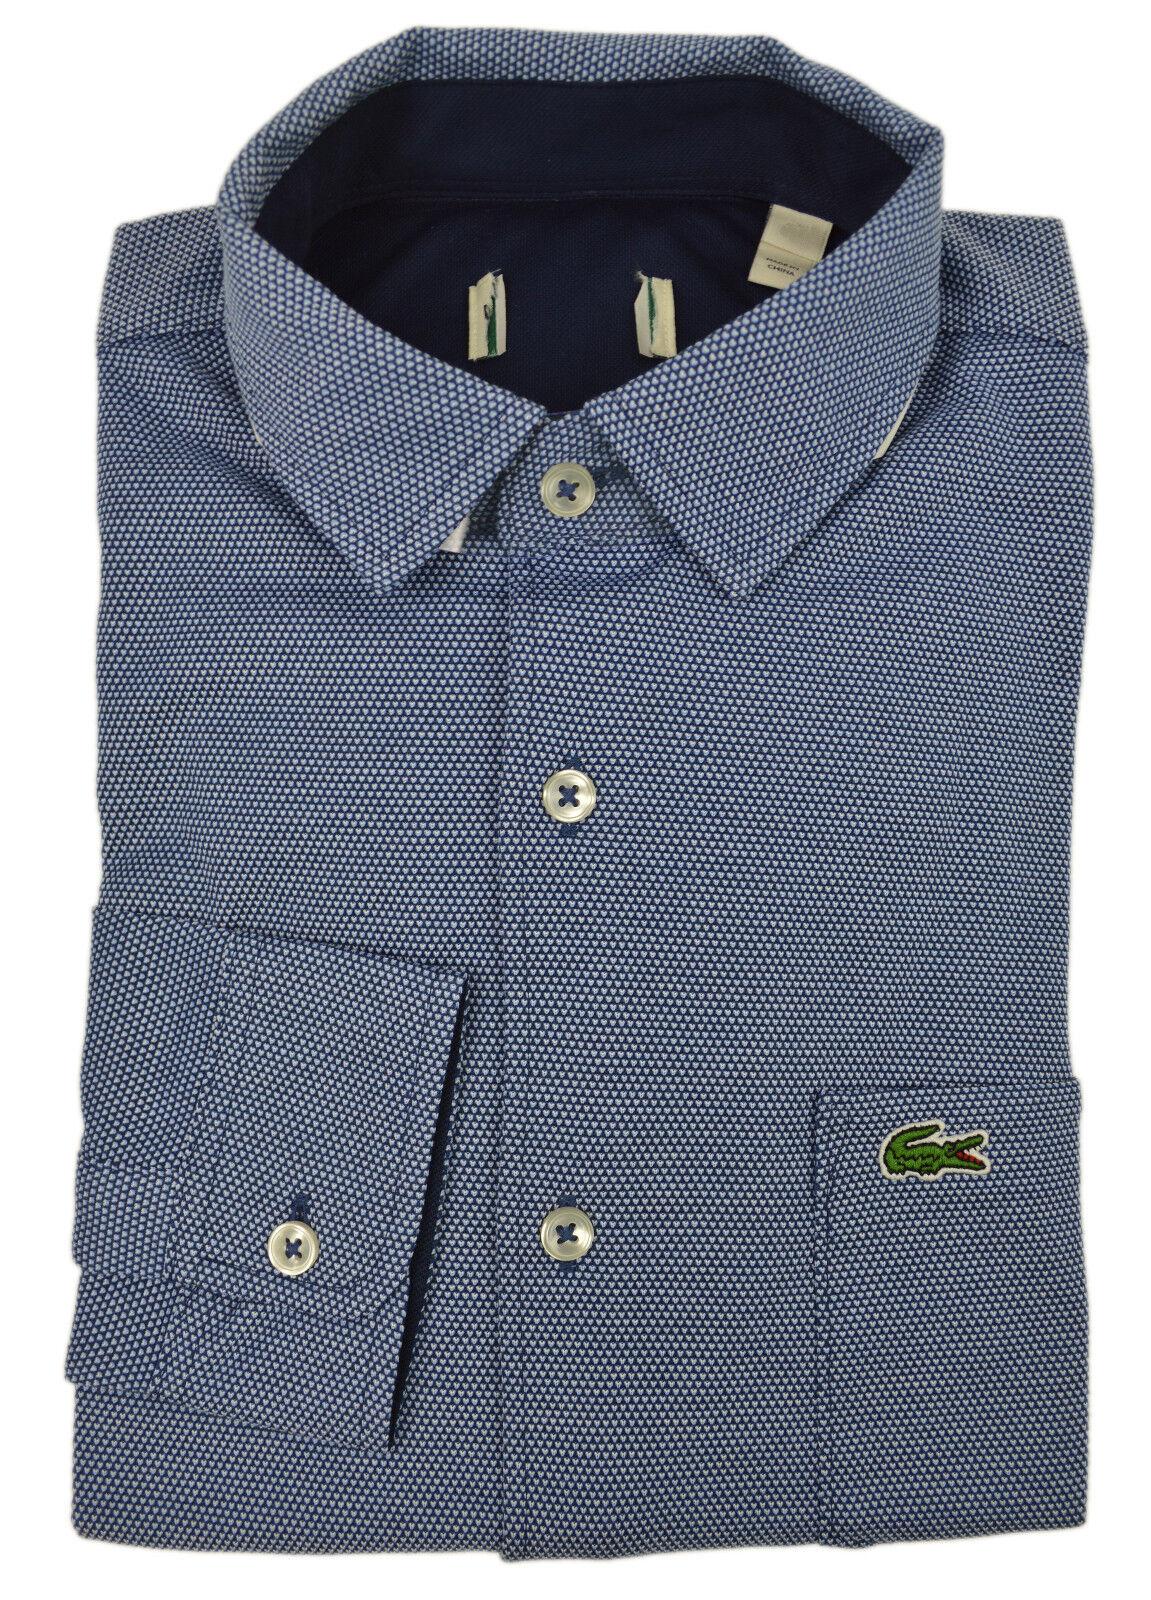 Lacoste NWD Mens Blue Textured Soft Knit Button Down Shirt Sz 40 Medium M